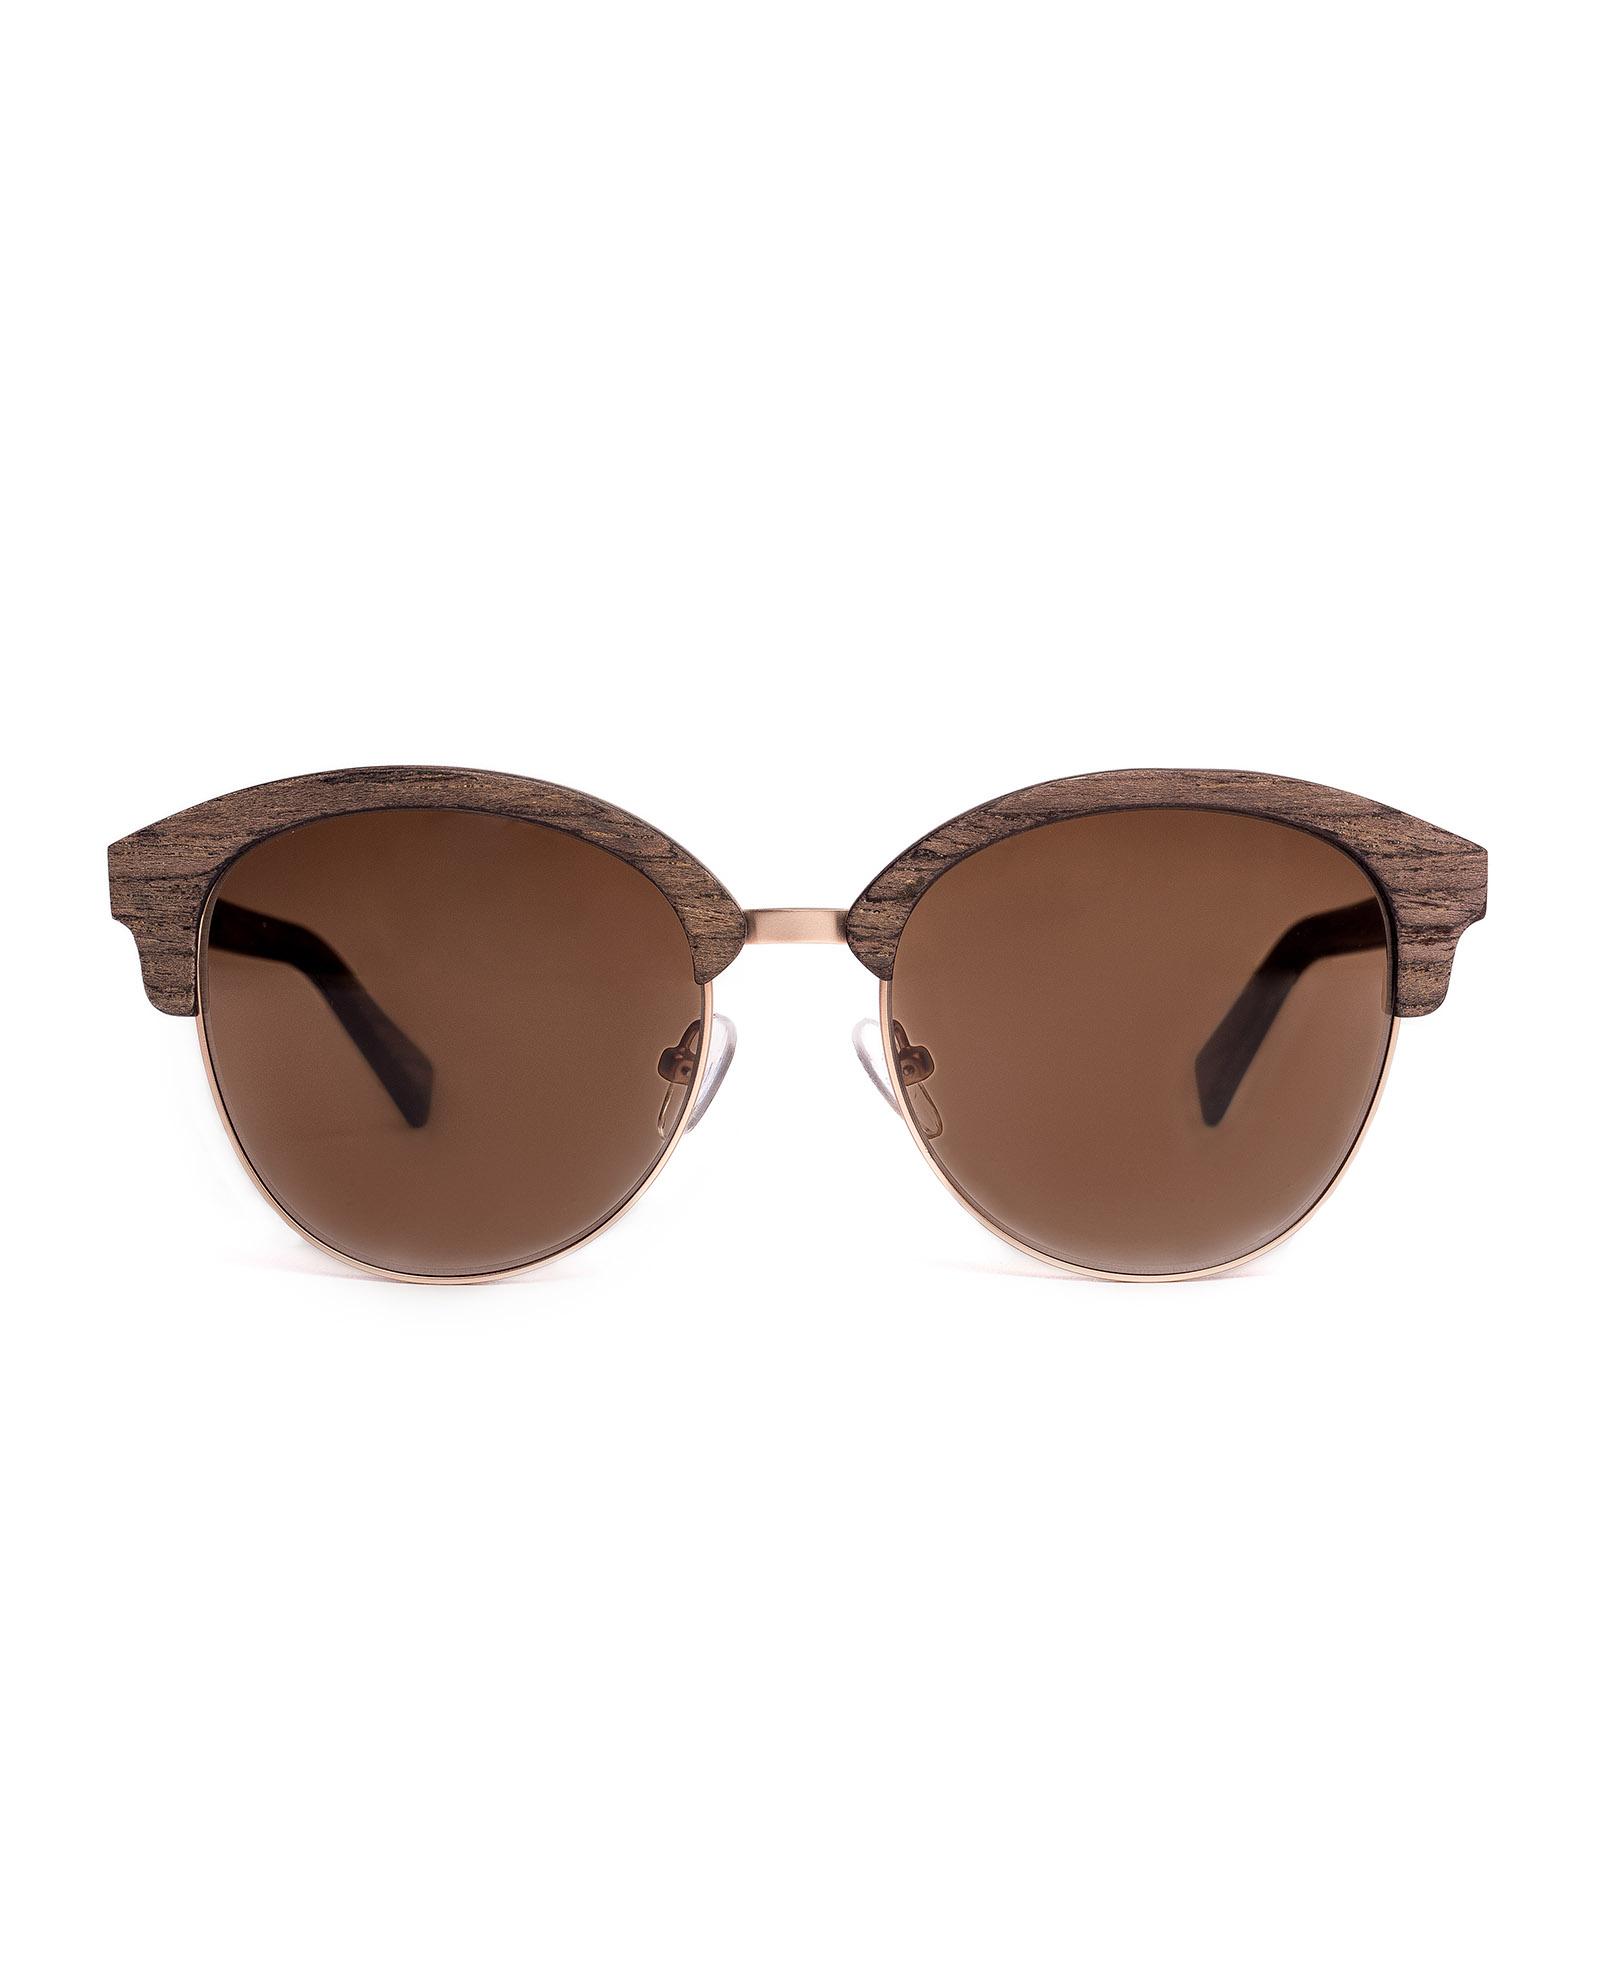 31a7a1f0e9 Sunny Sydney - Wooden Sunglasses - Woodiu